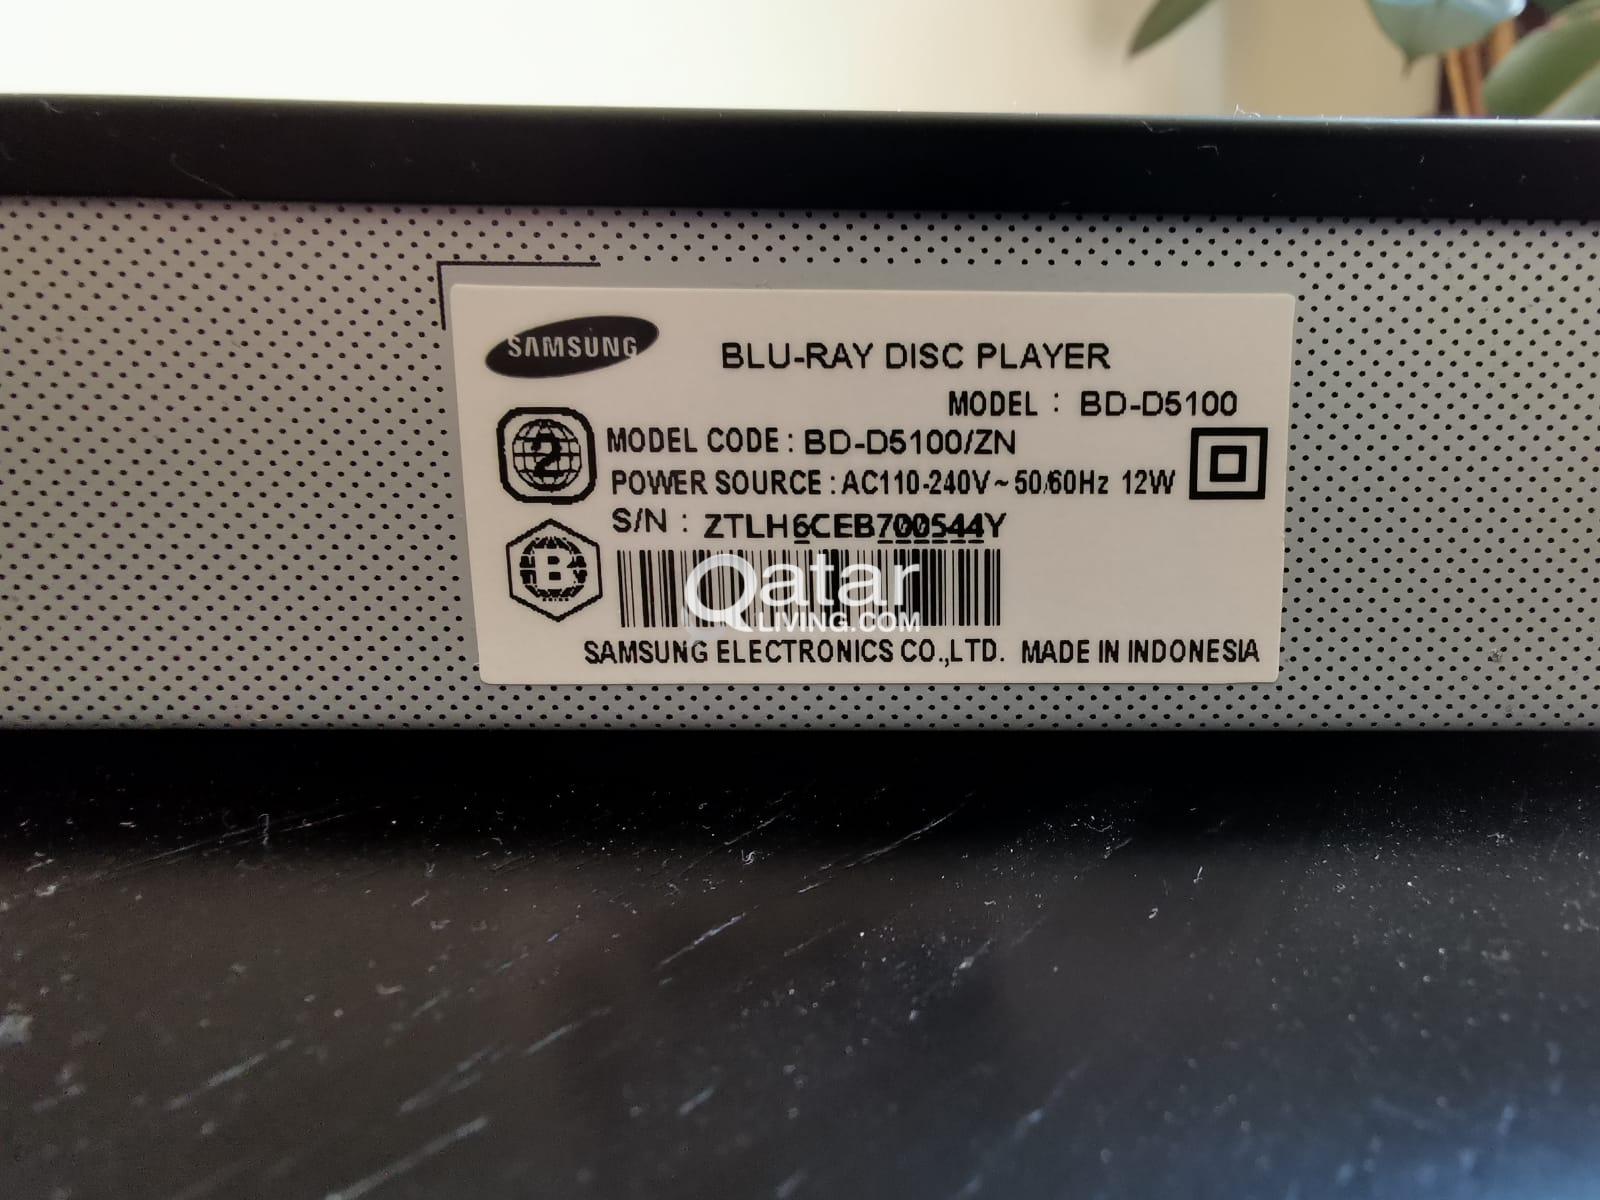 PANASONIC MODEL: TX-L37G20BA TV & DVD player